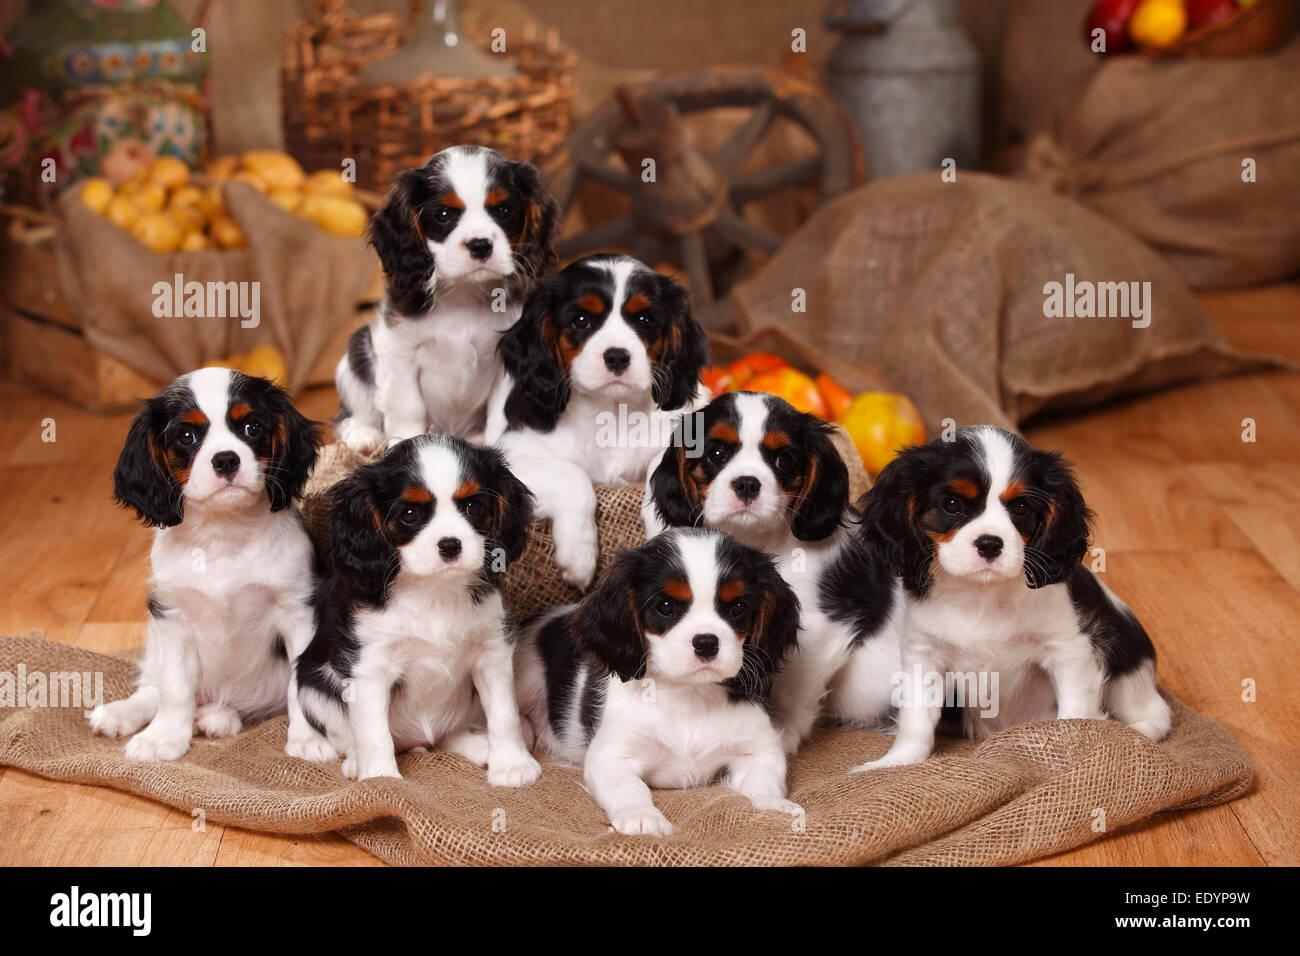 Cavalier King Charles Spaniel Puppies Fotos E Imagenes De Stock Alamy